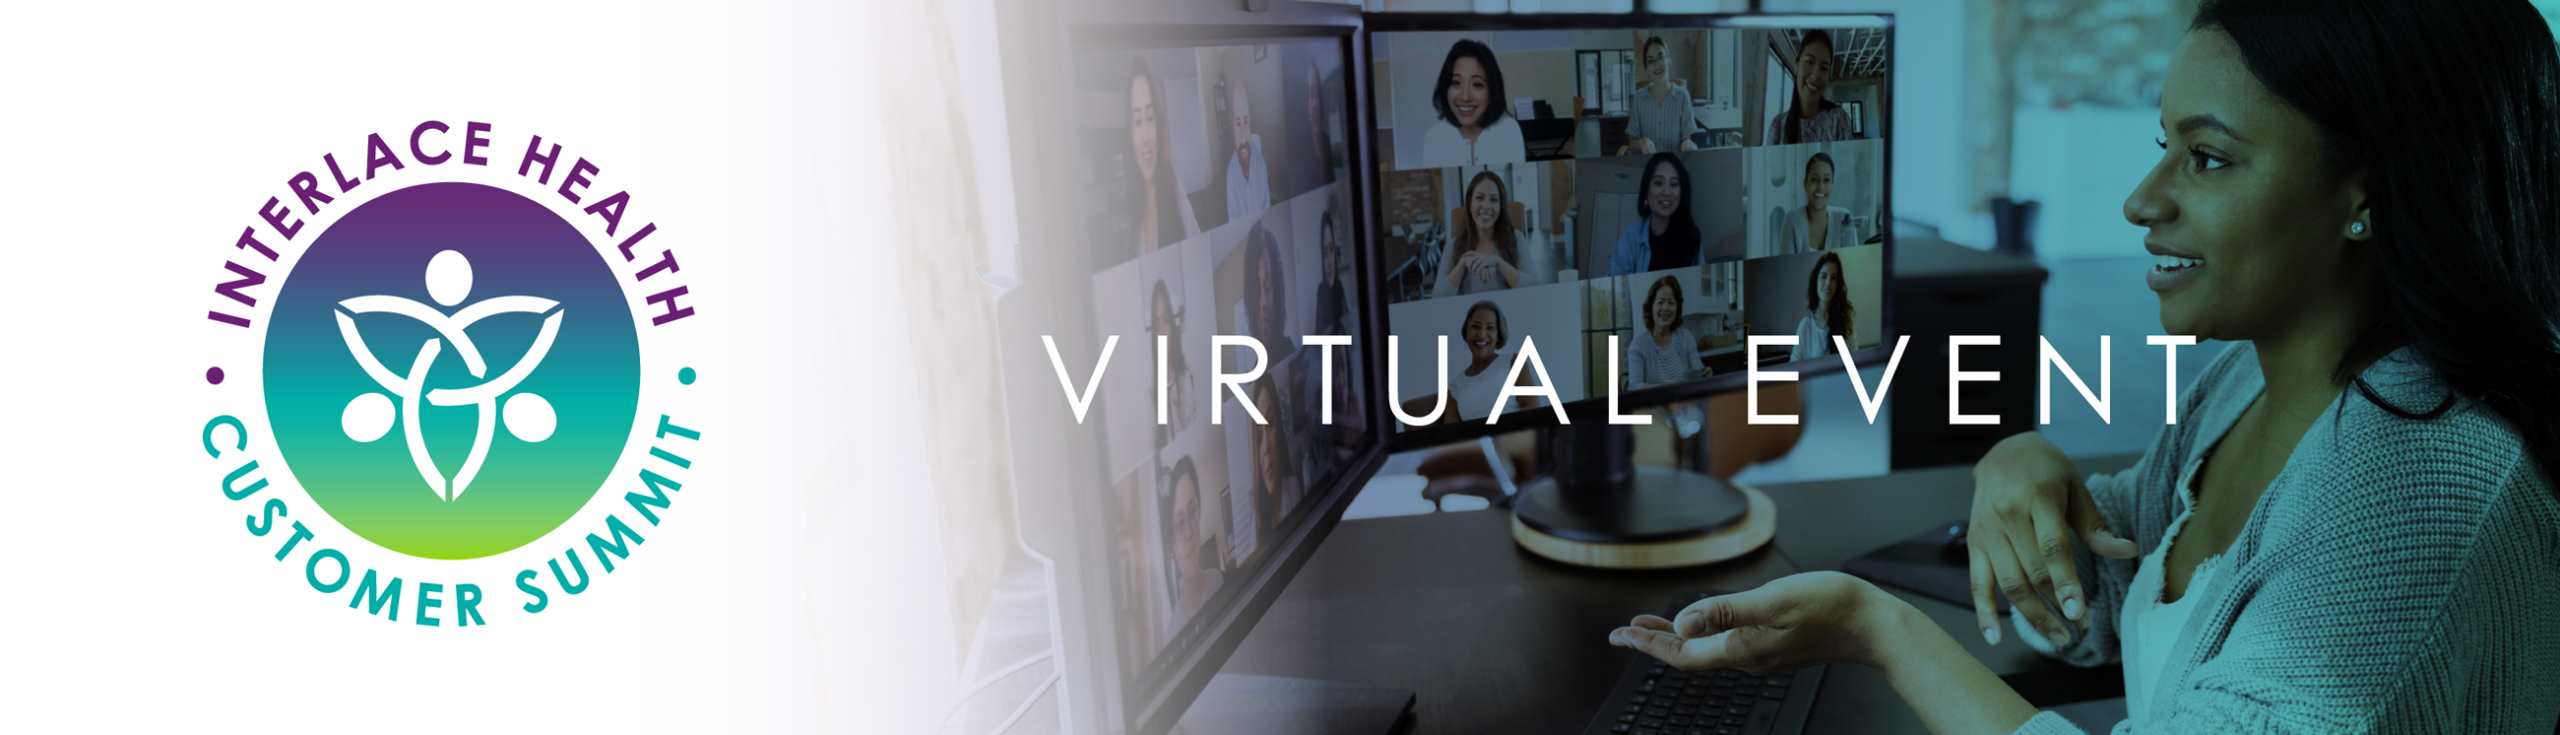 Customer Summit Virtual Event